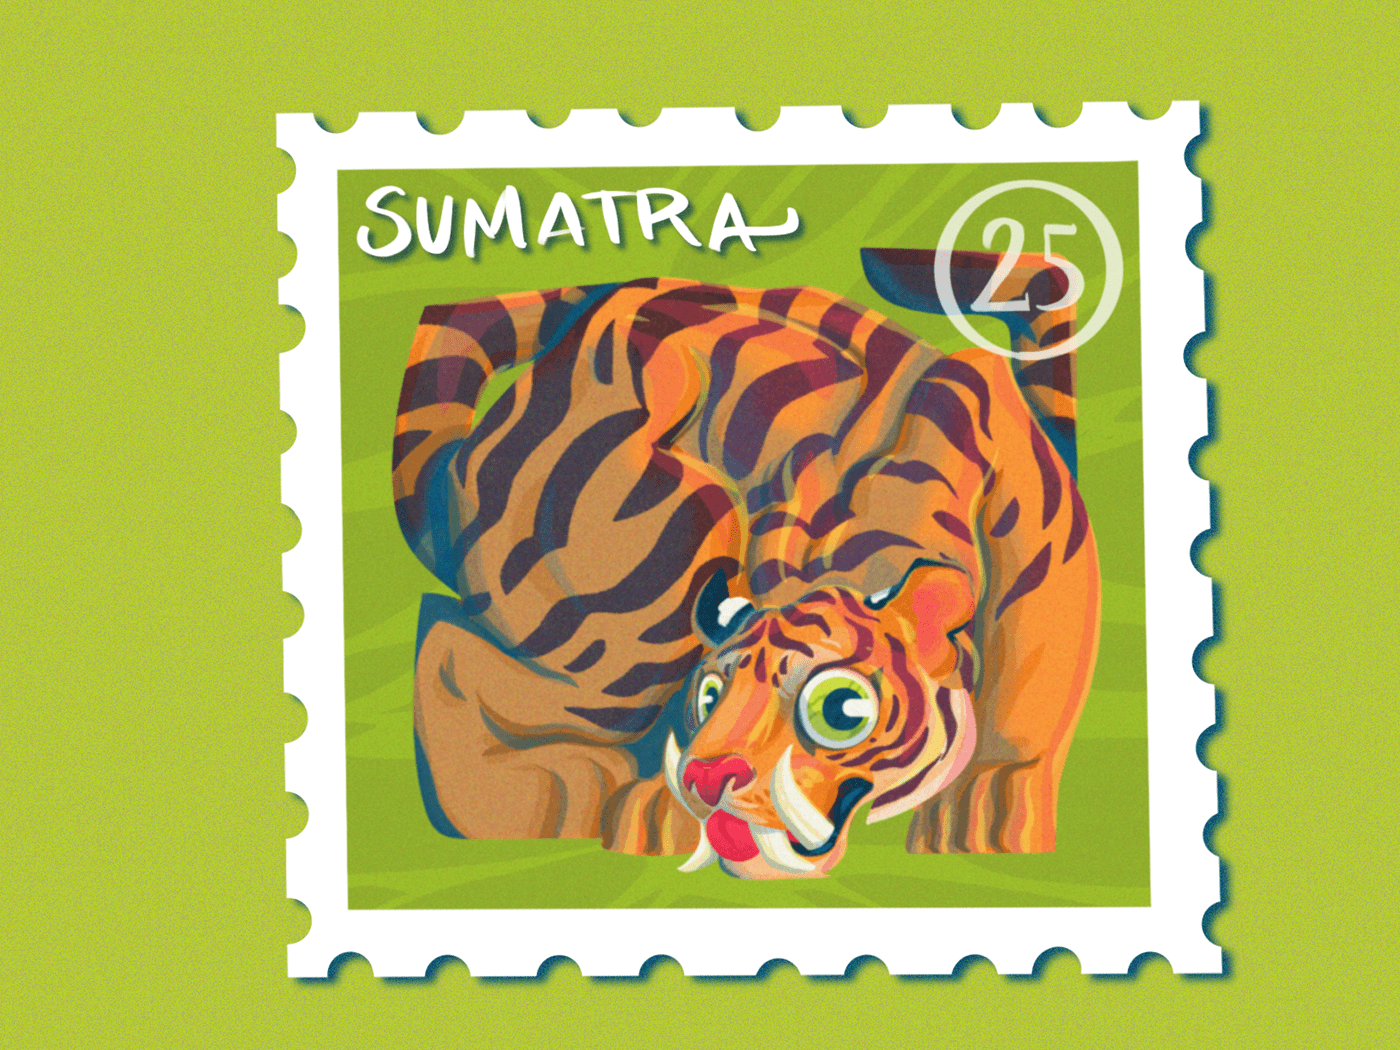 Image may contain: cartoon, animal and illustration